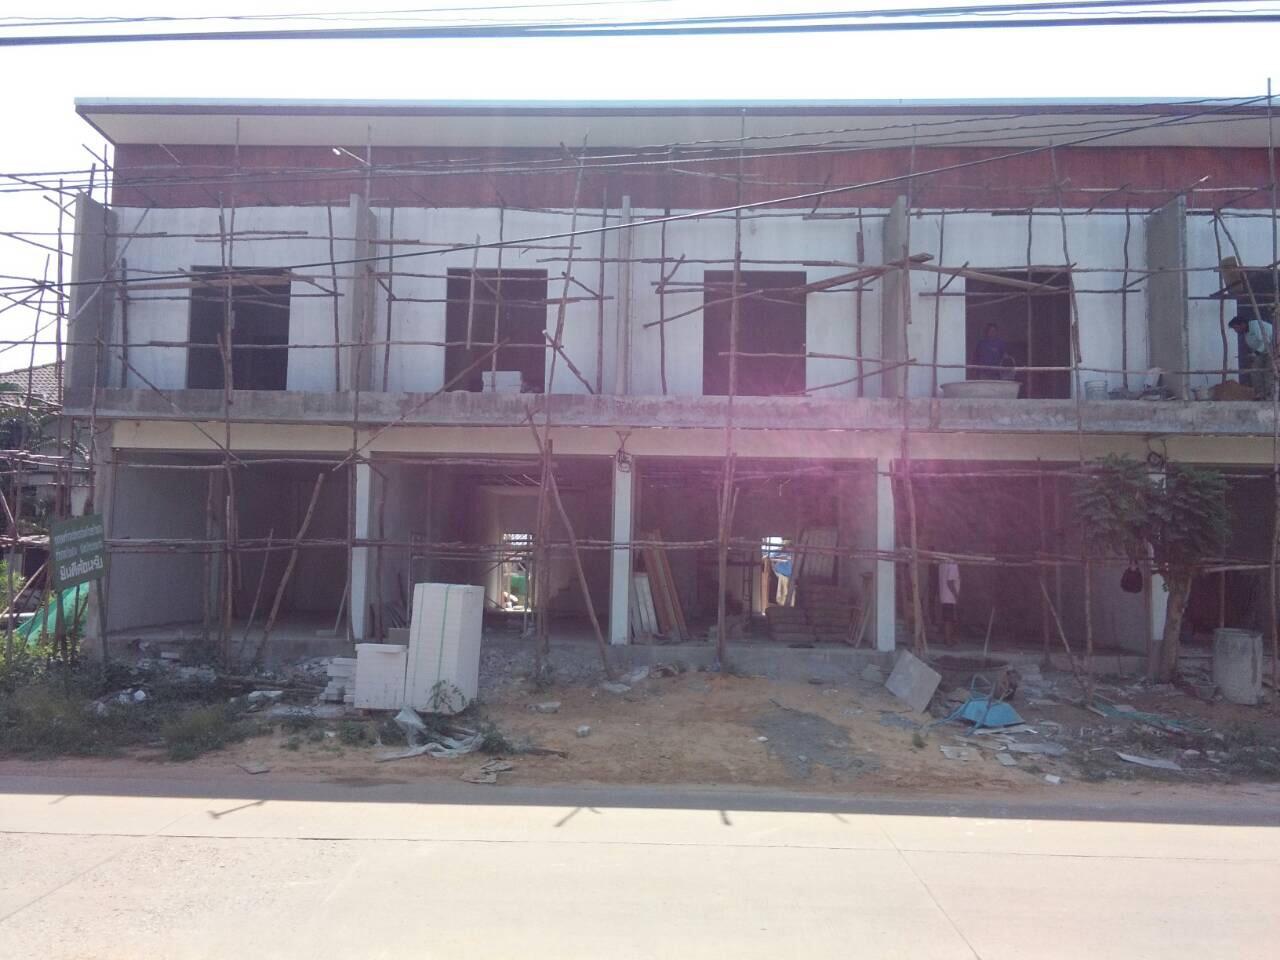 Khon Kaen Housebuilder (9) Khon Kaen construction khon kaen building company.jpe